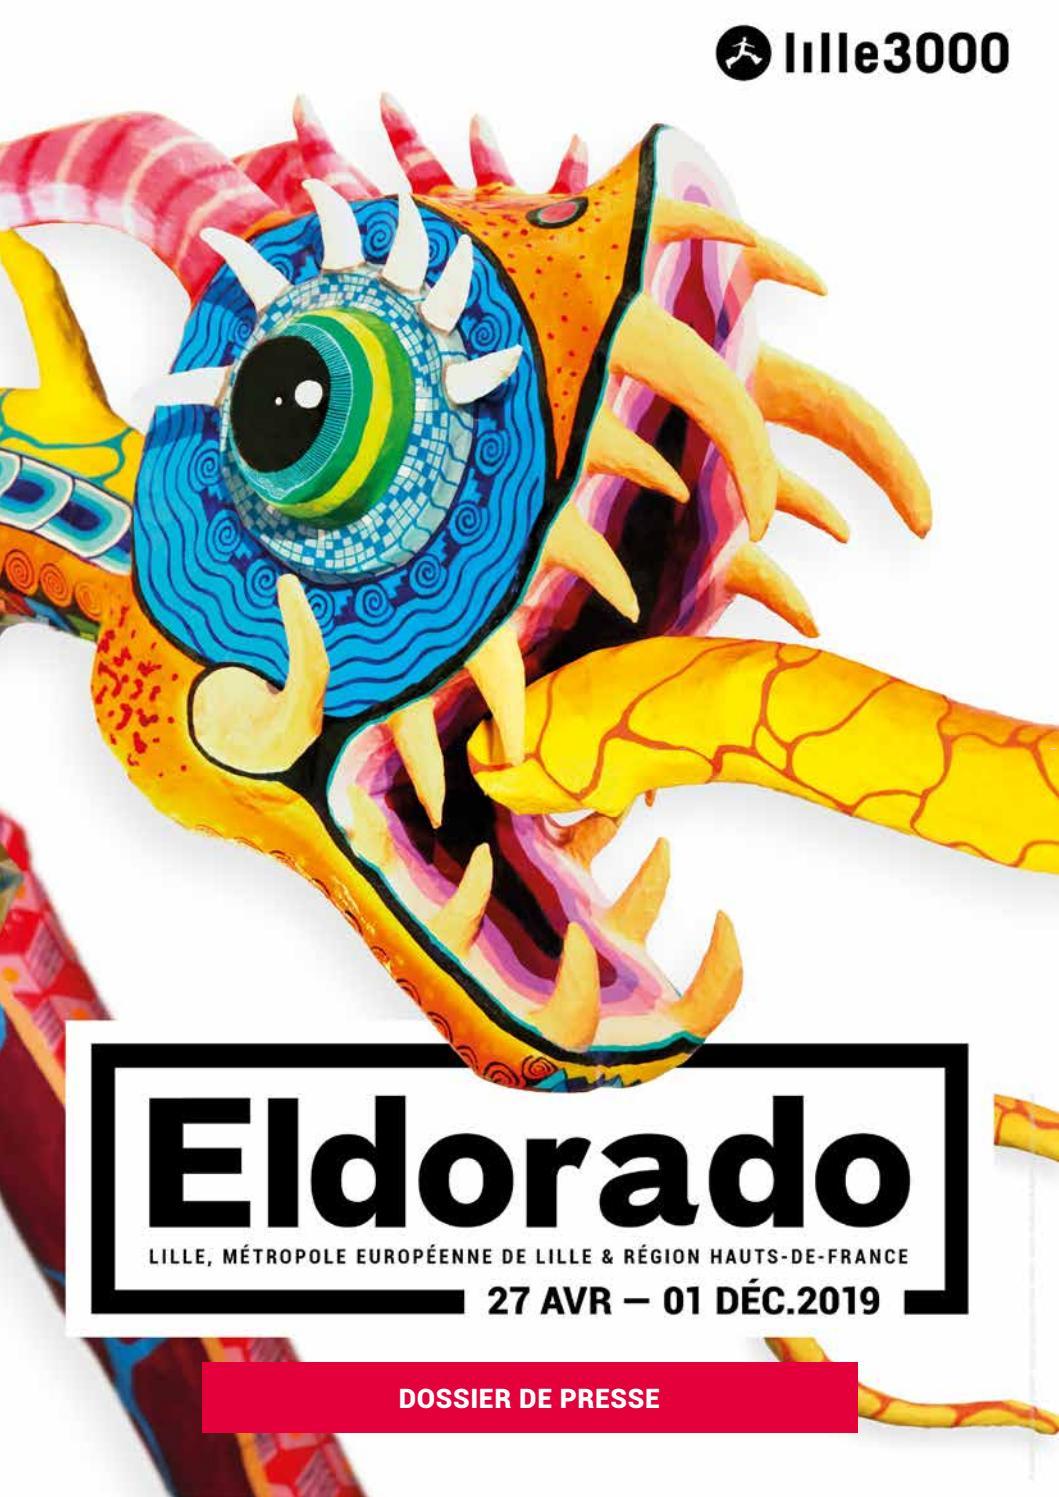 foto de Dossier de presse - Eldorado - lille3000 by lille3000 - issuu